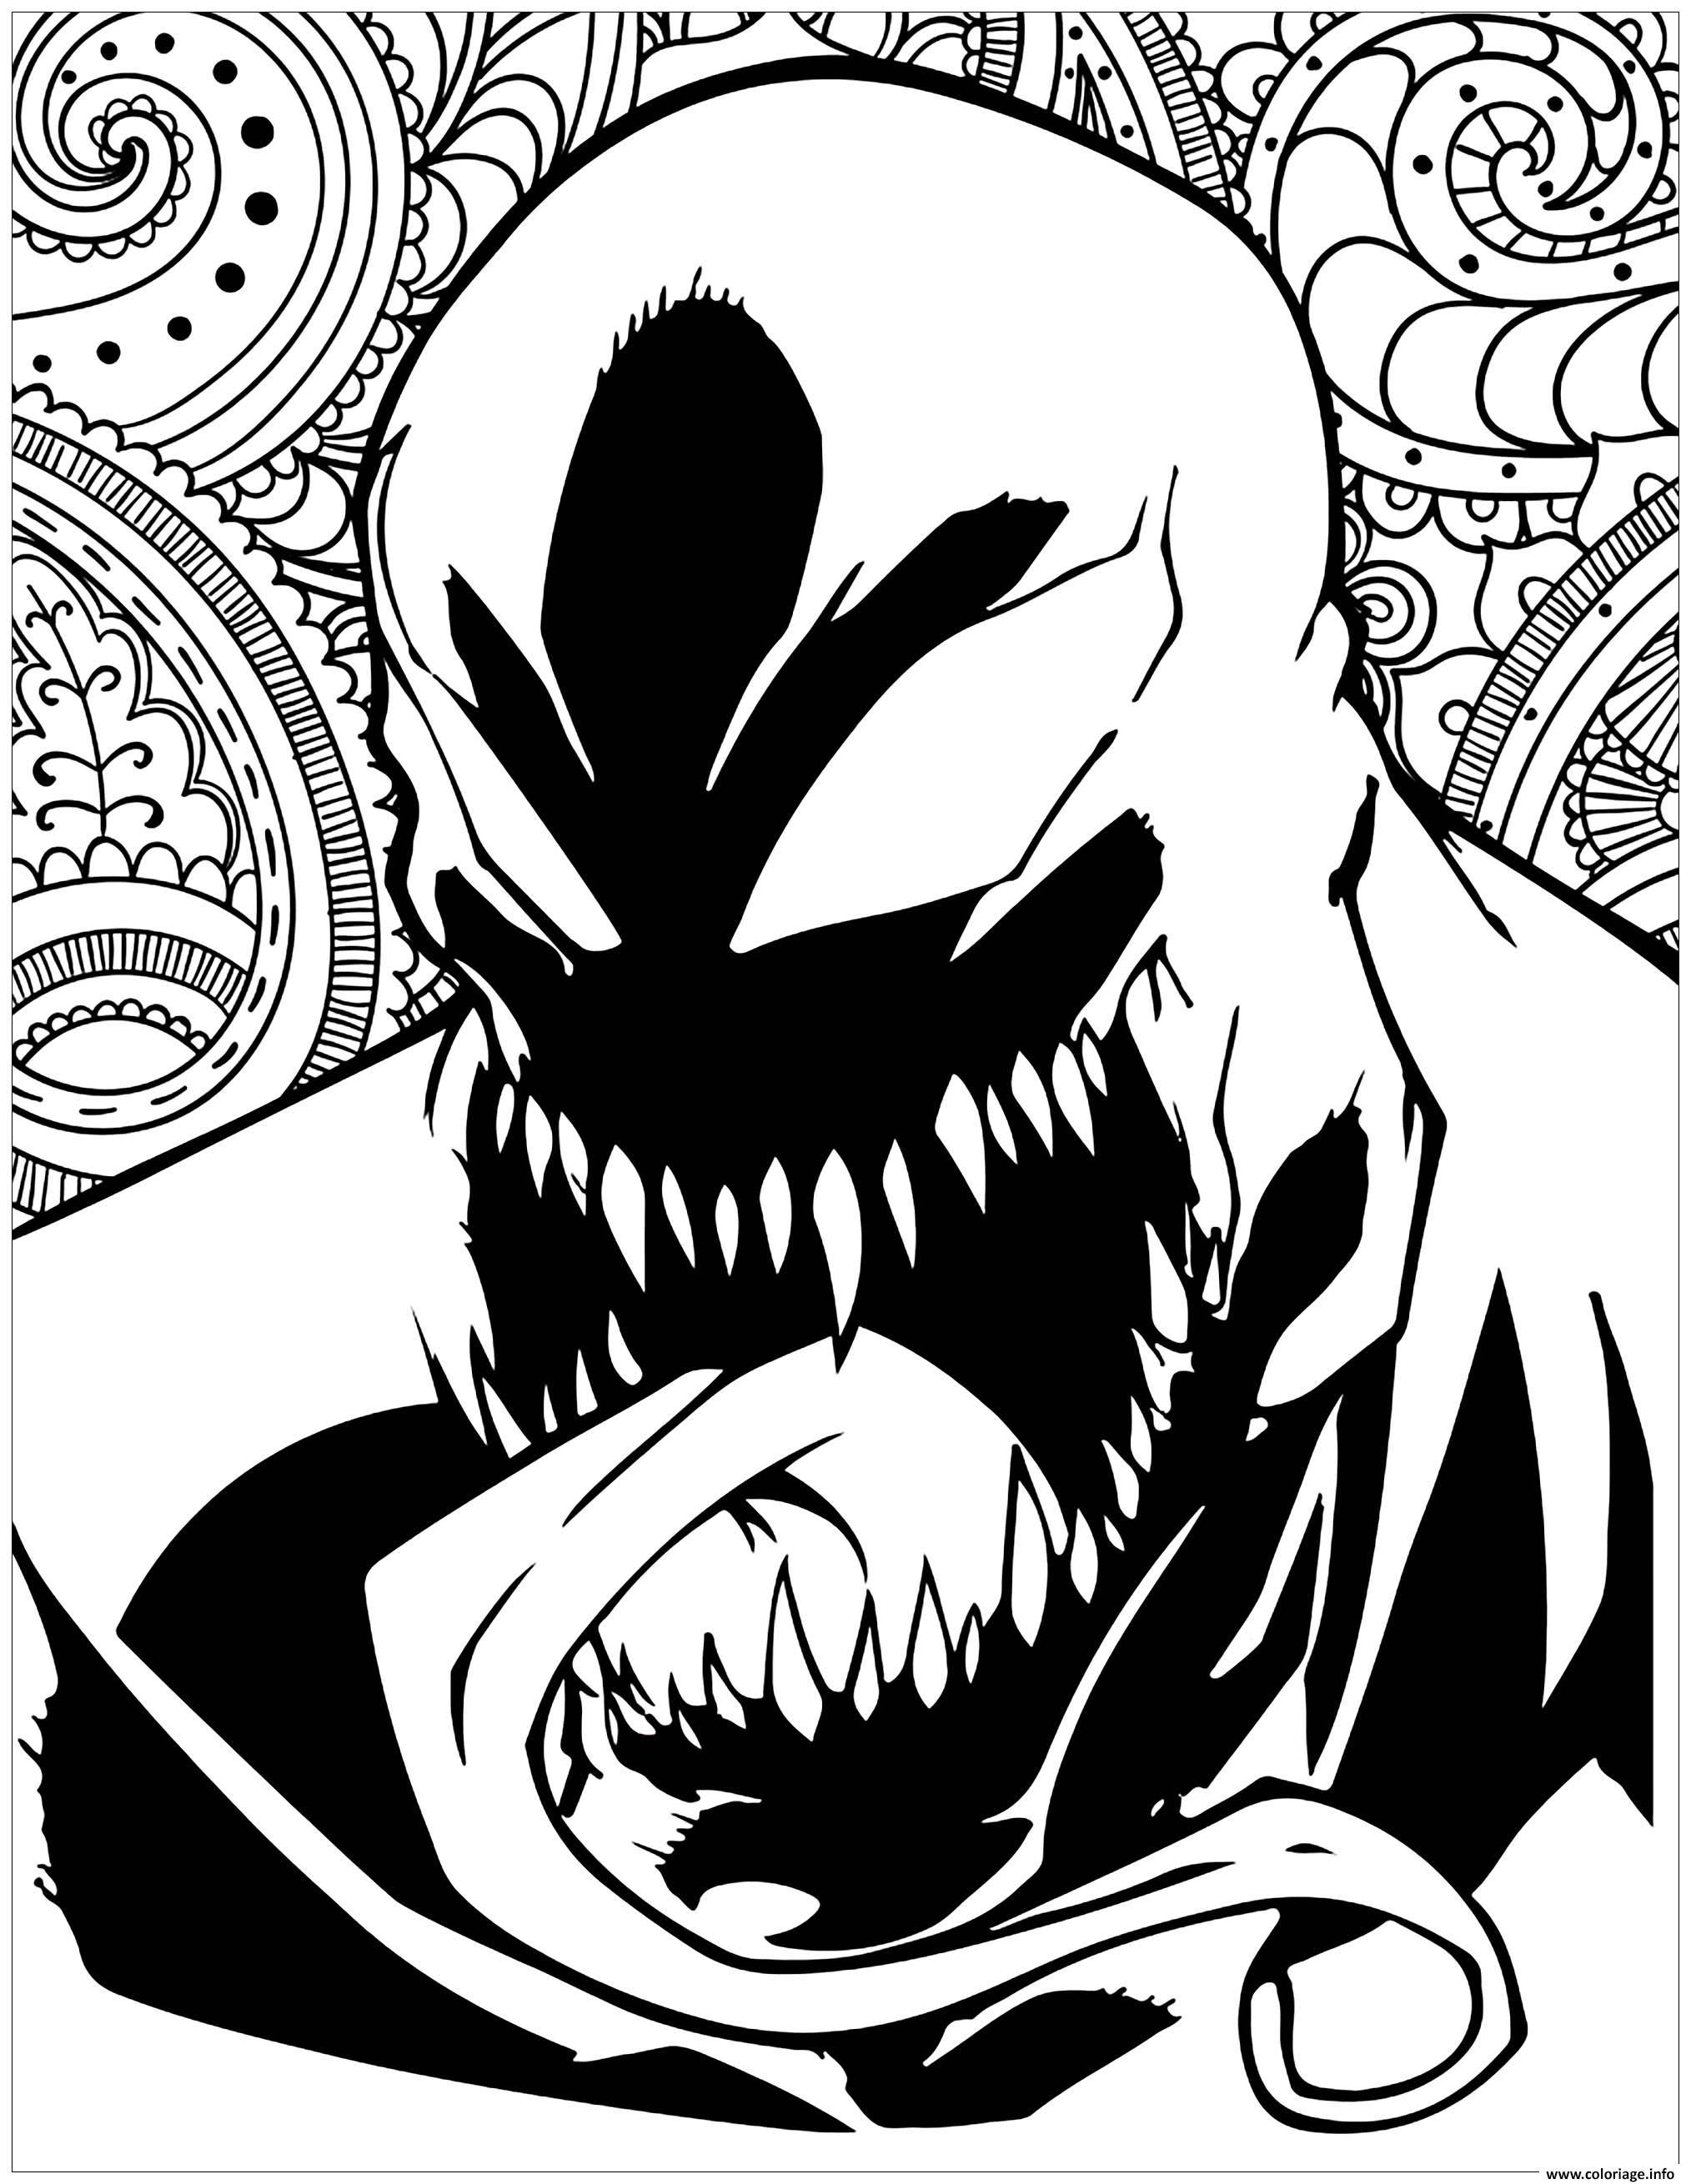 Venom Coloring Pages Lego Venom Spider Marvel Heroes: Coloriage Mechants Marvel Venom